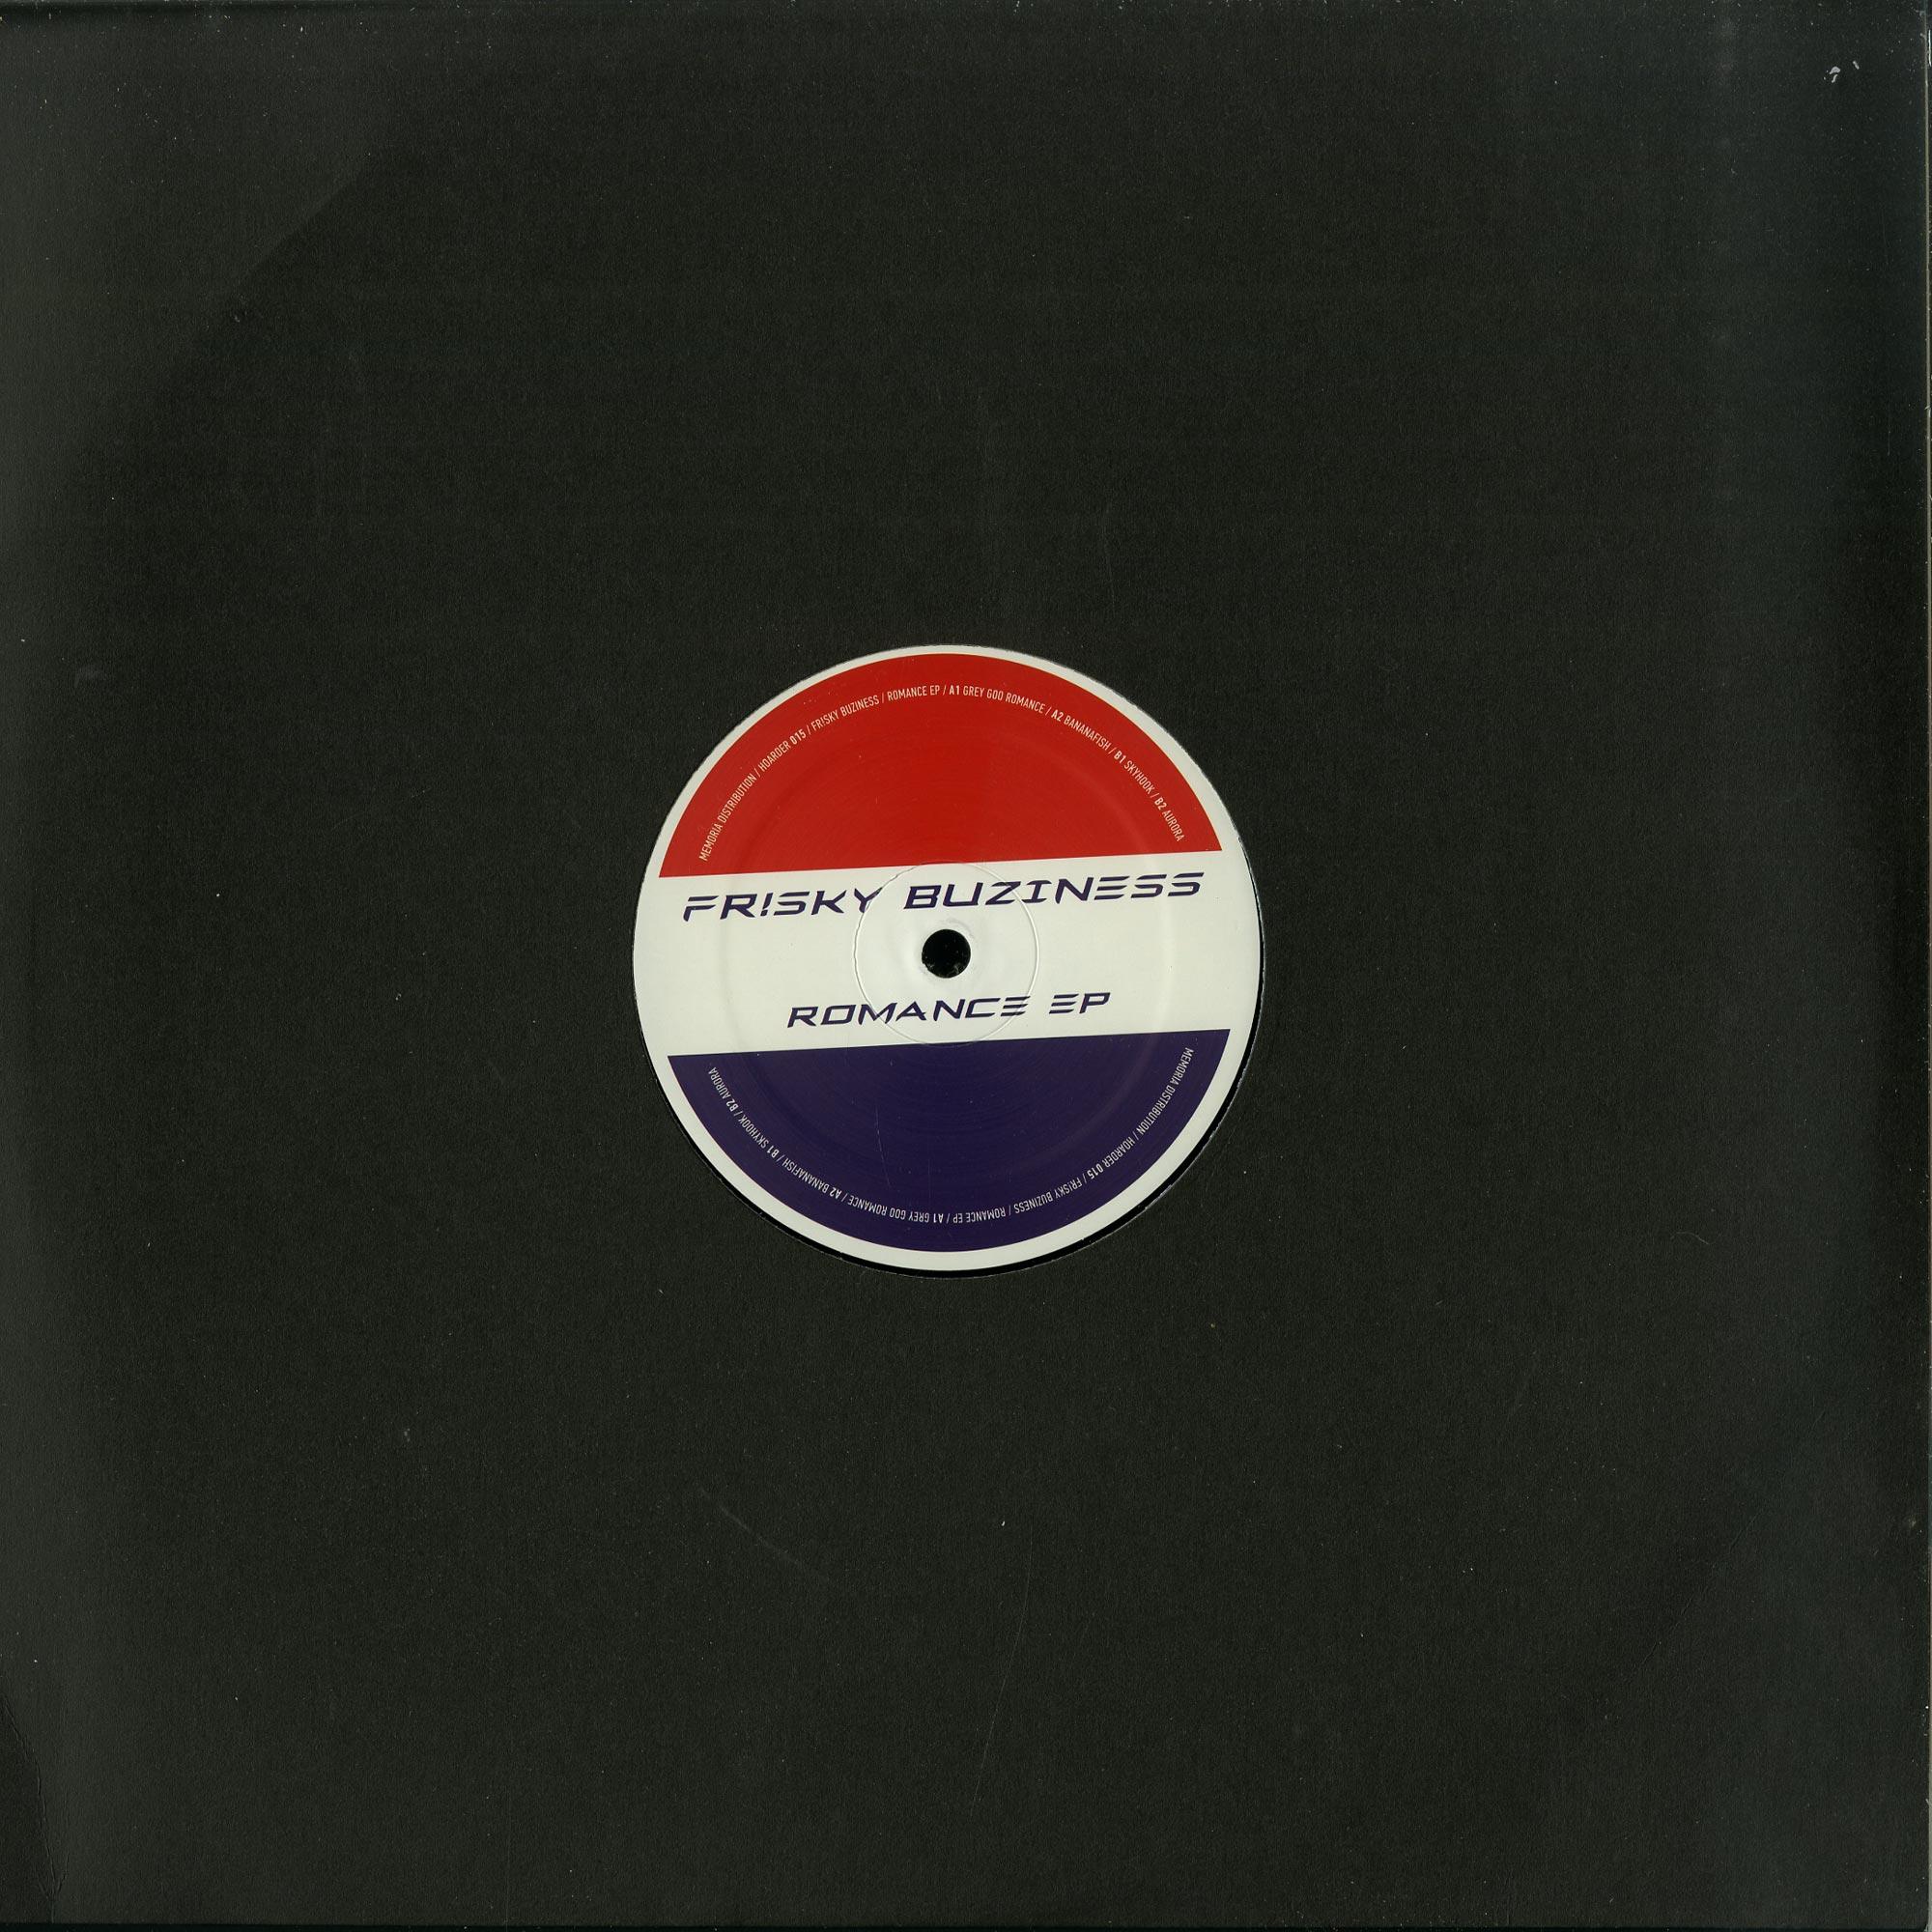 Fr!sky Buziness - ROMANCE EP